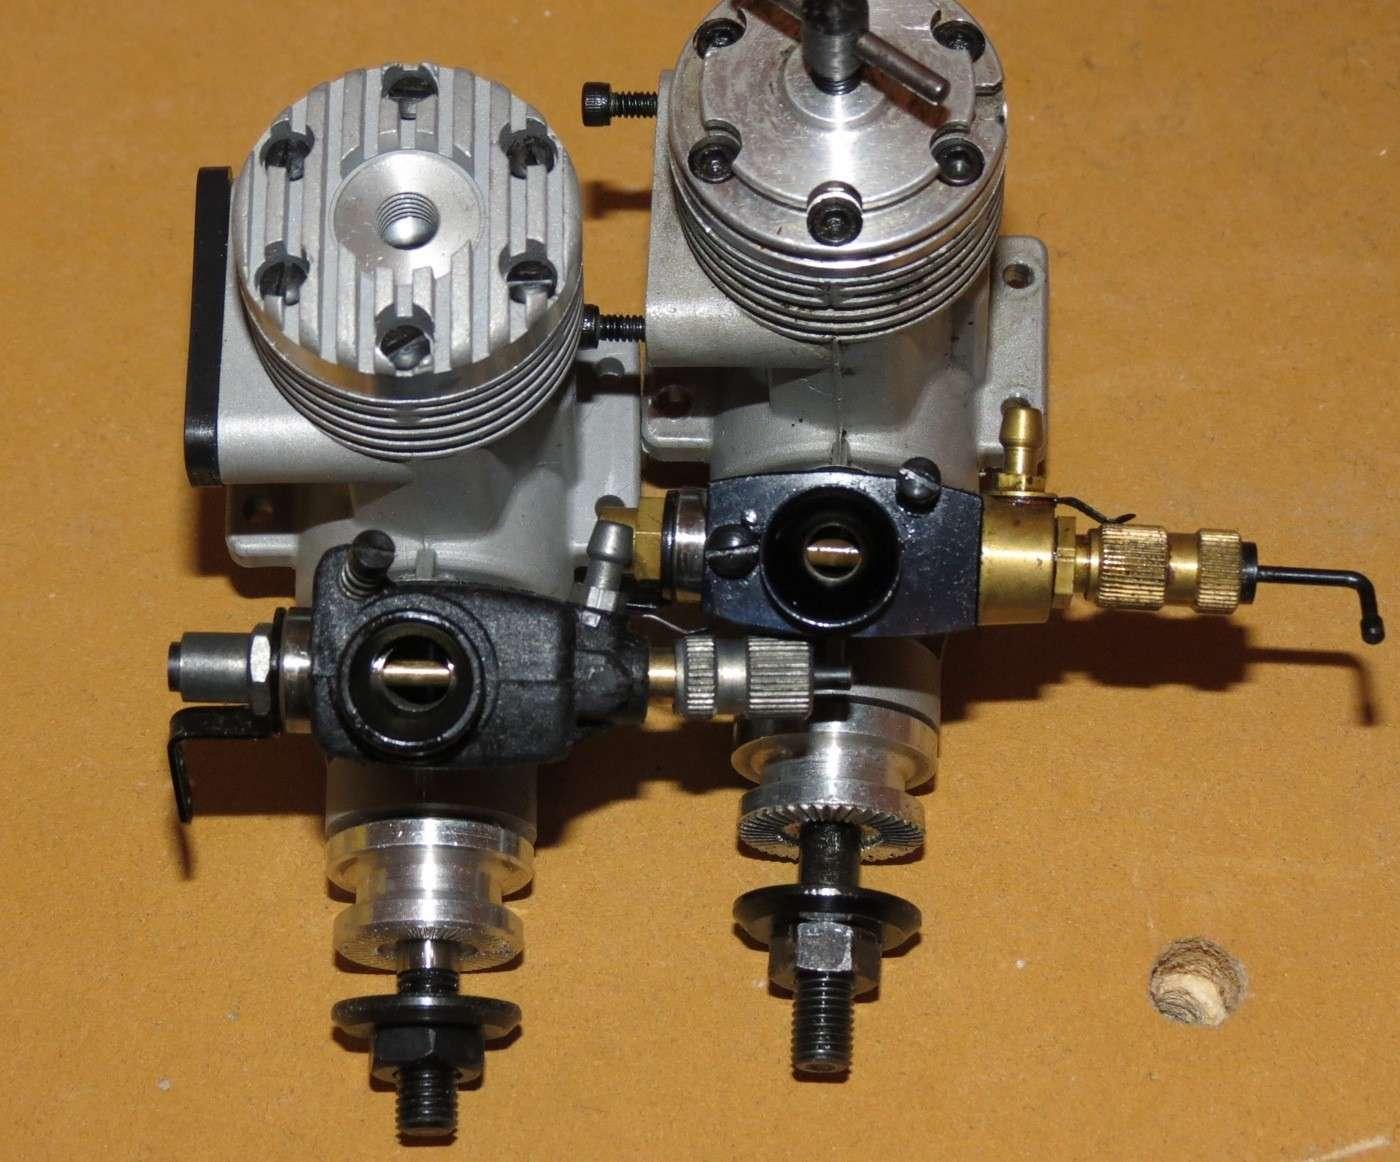 Irvine 20 ABC Diesel/Glow special Img_0310